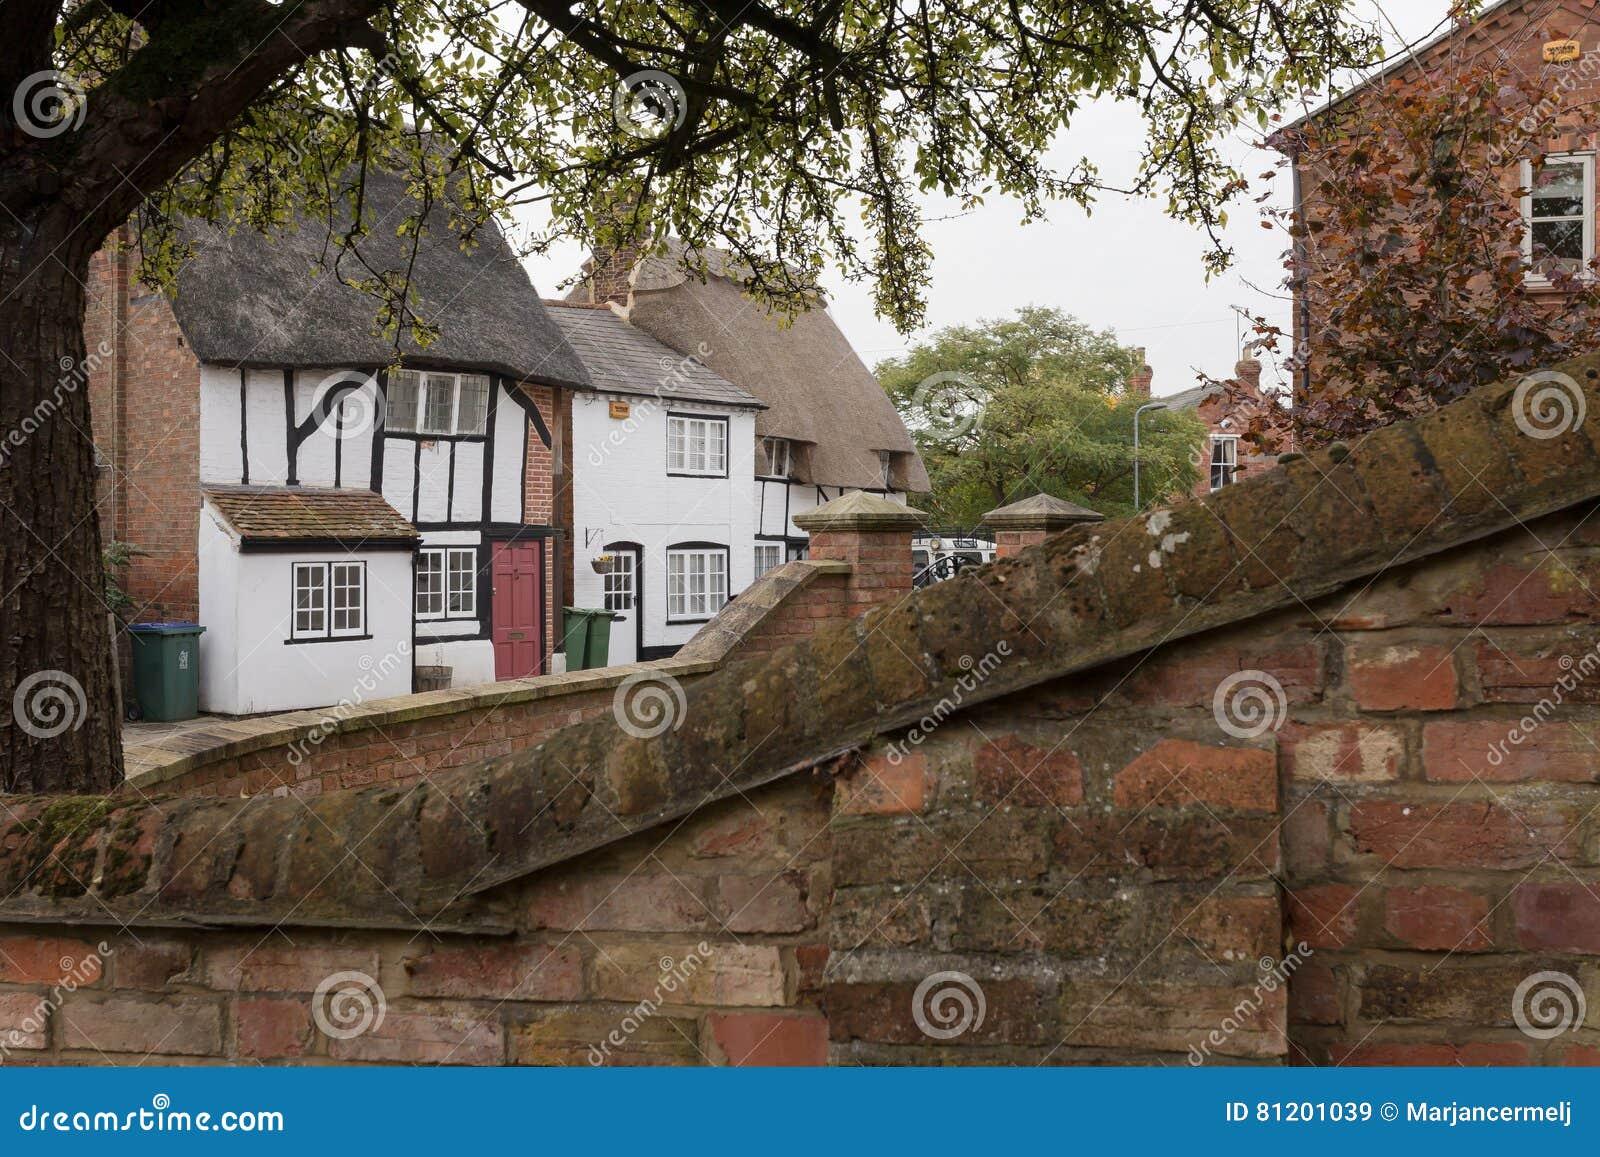 Winslow, Buckinghamshire, Vereinigtes Königreich, am 25. Oktober 2016: Ansicht